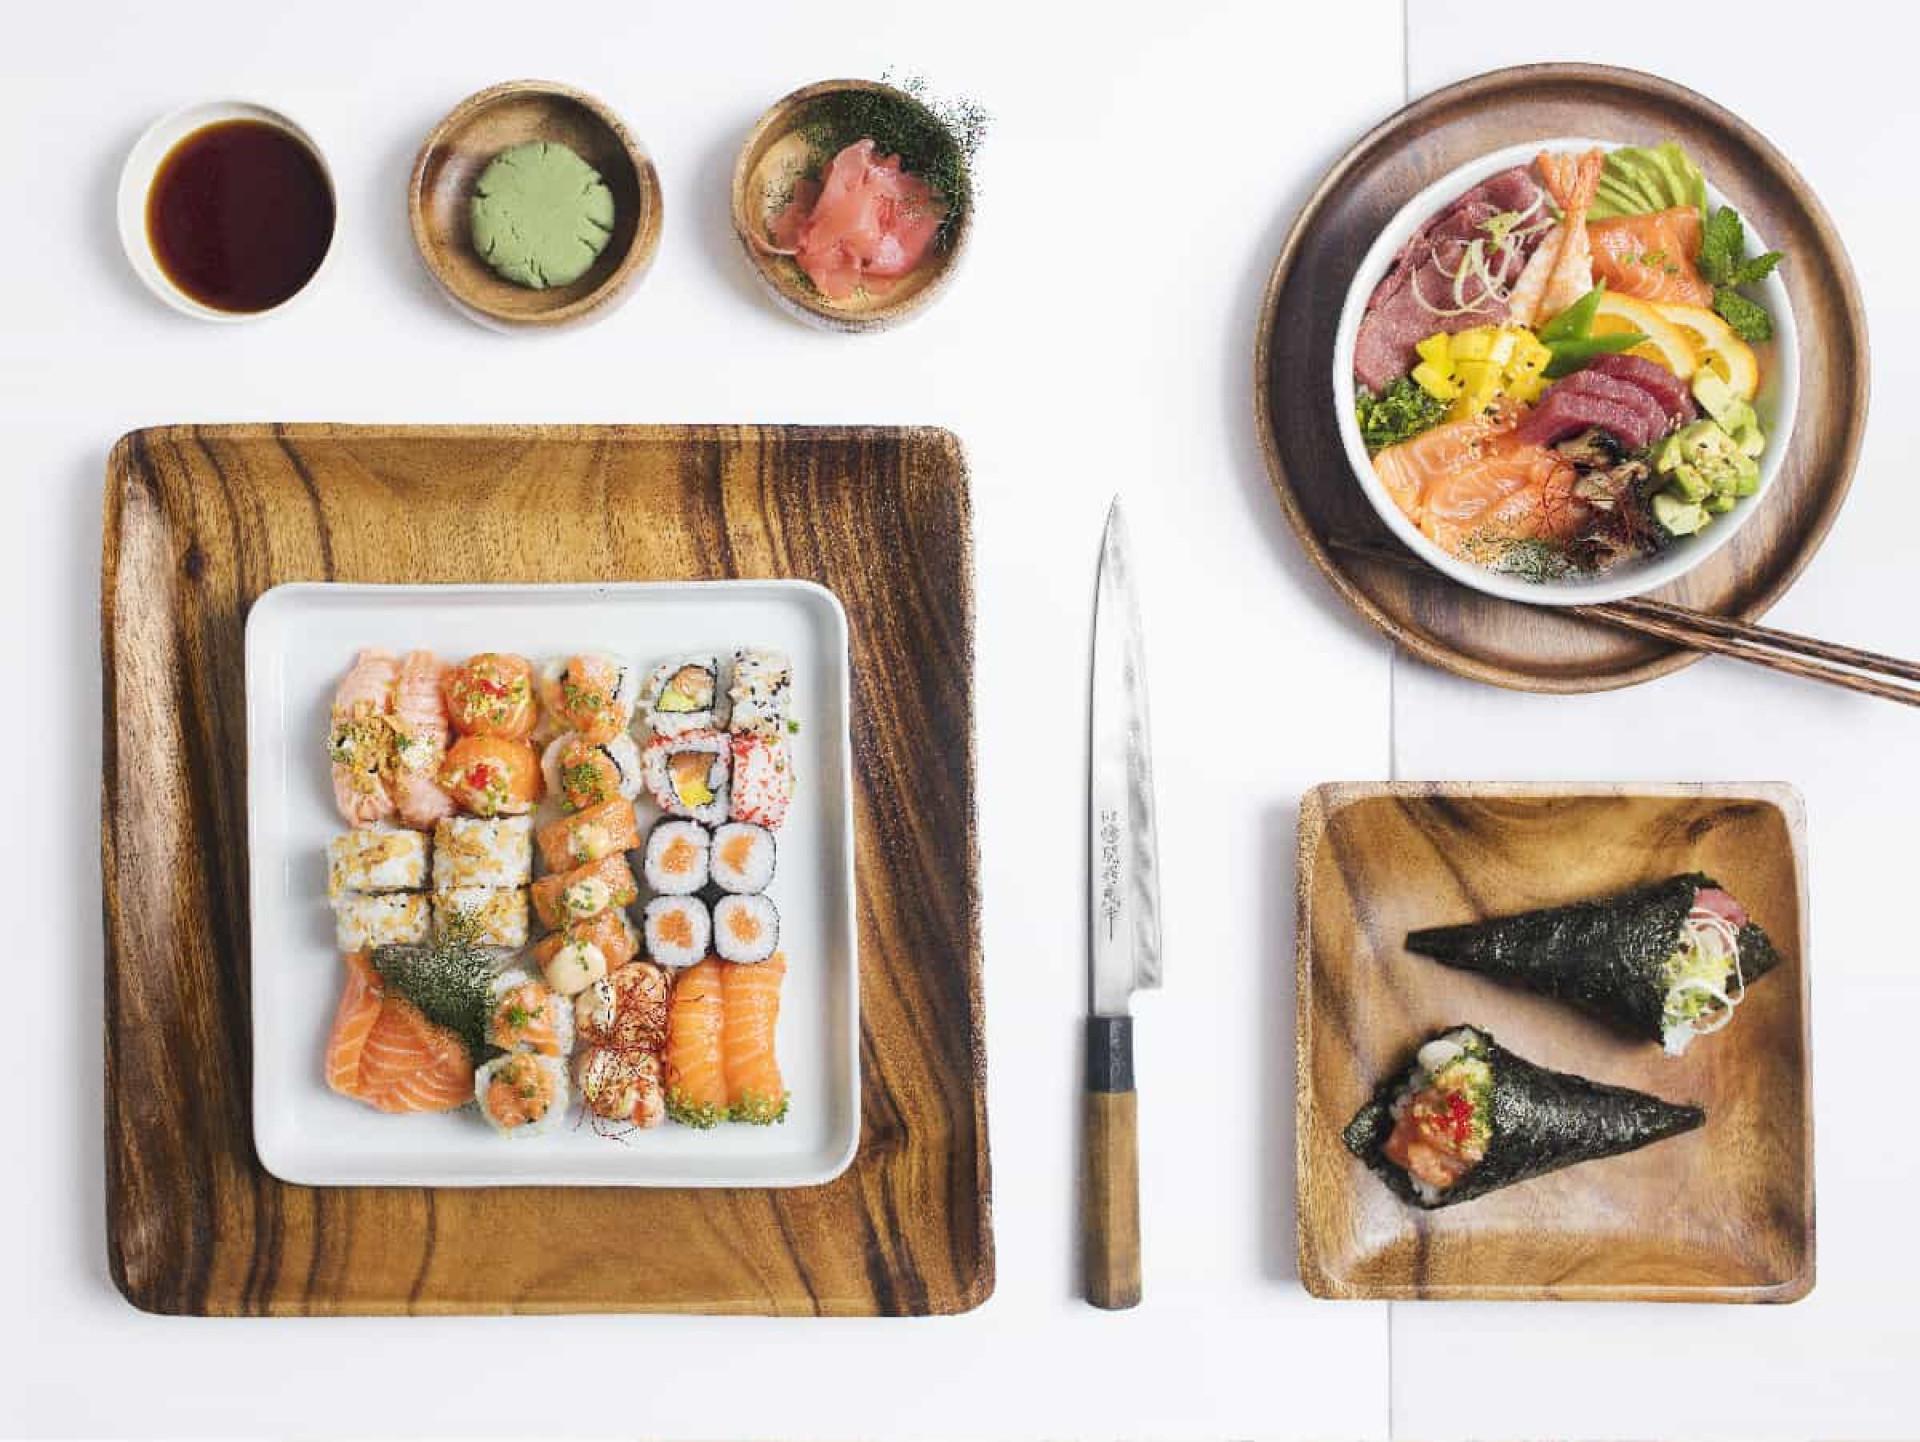 COOKOO The Kitchen Hub: O 1º hub de cozinhas que entrega em casa